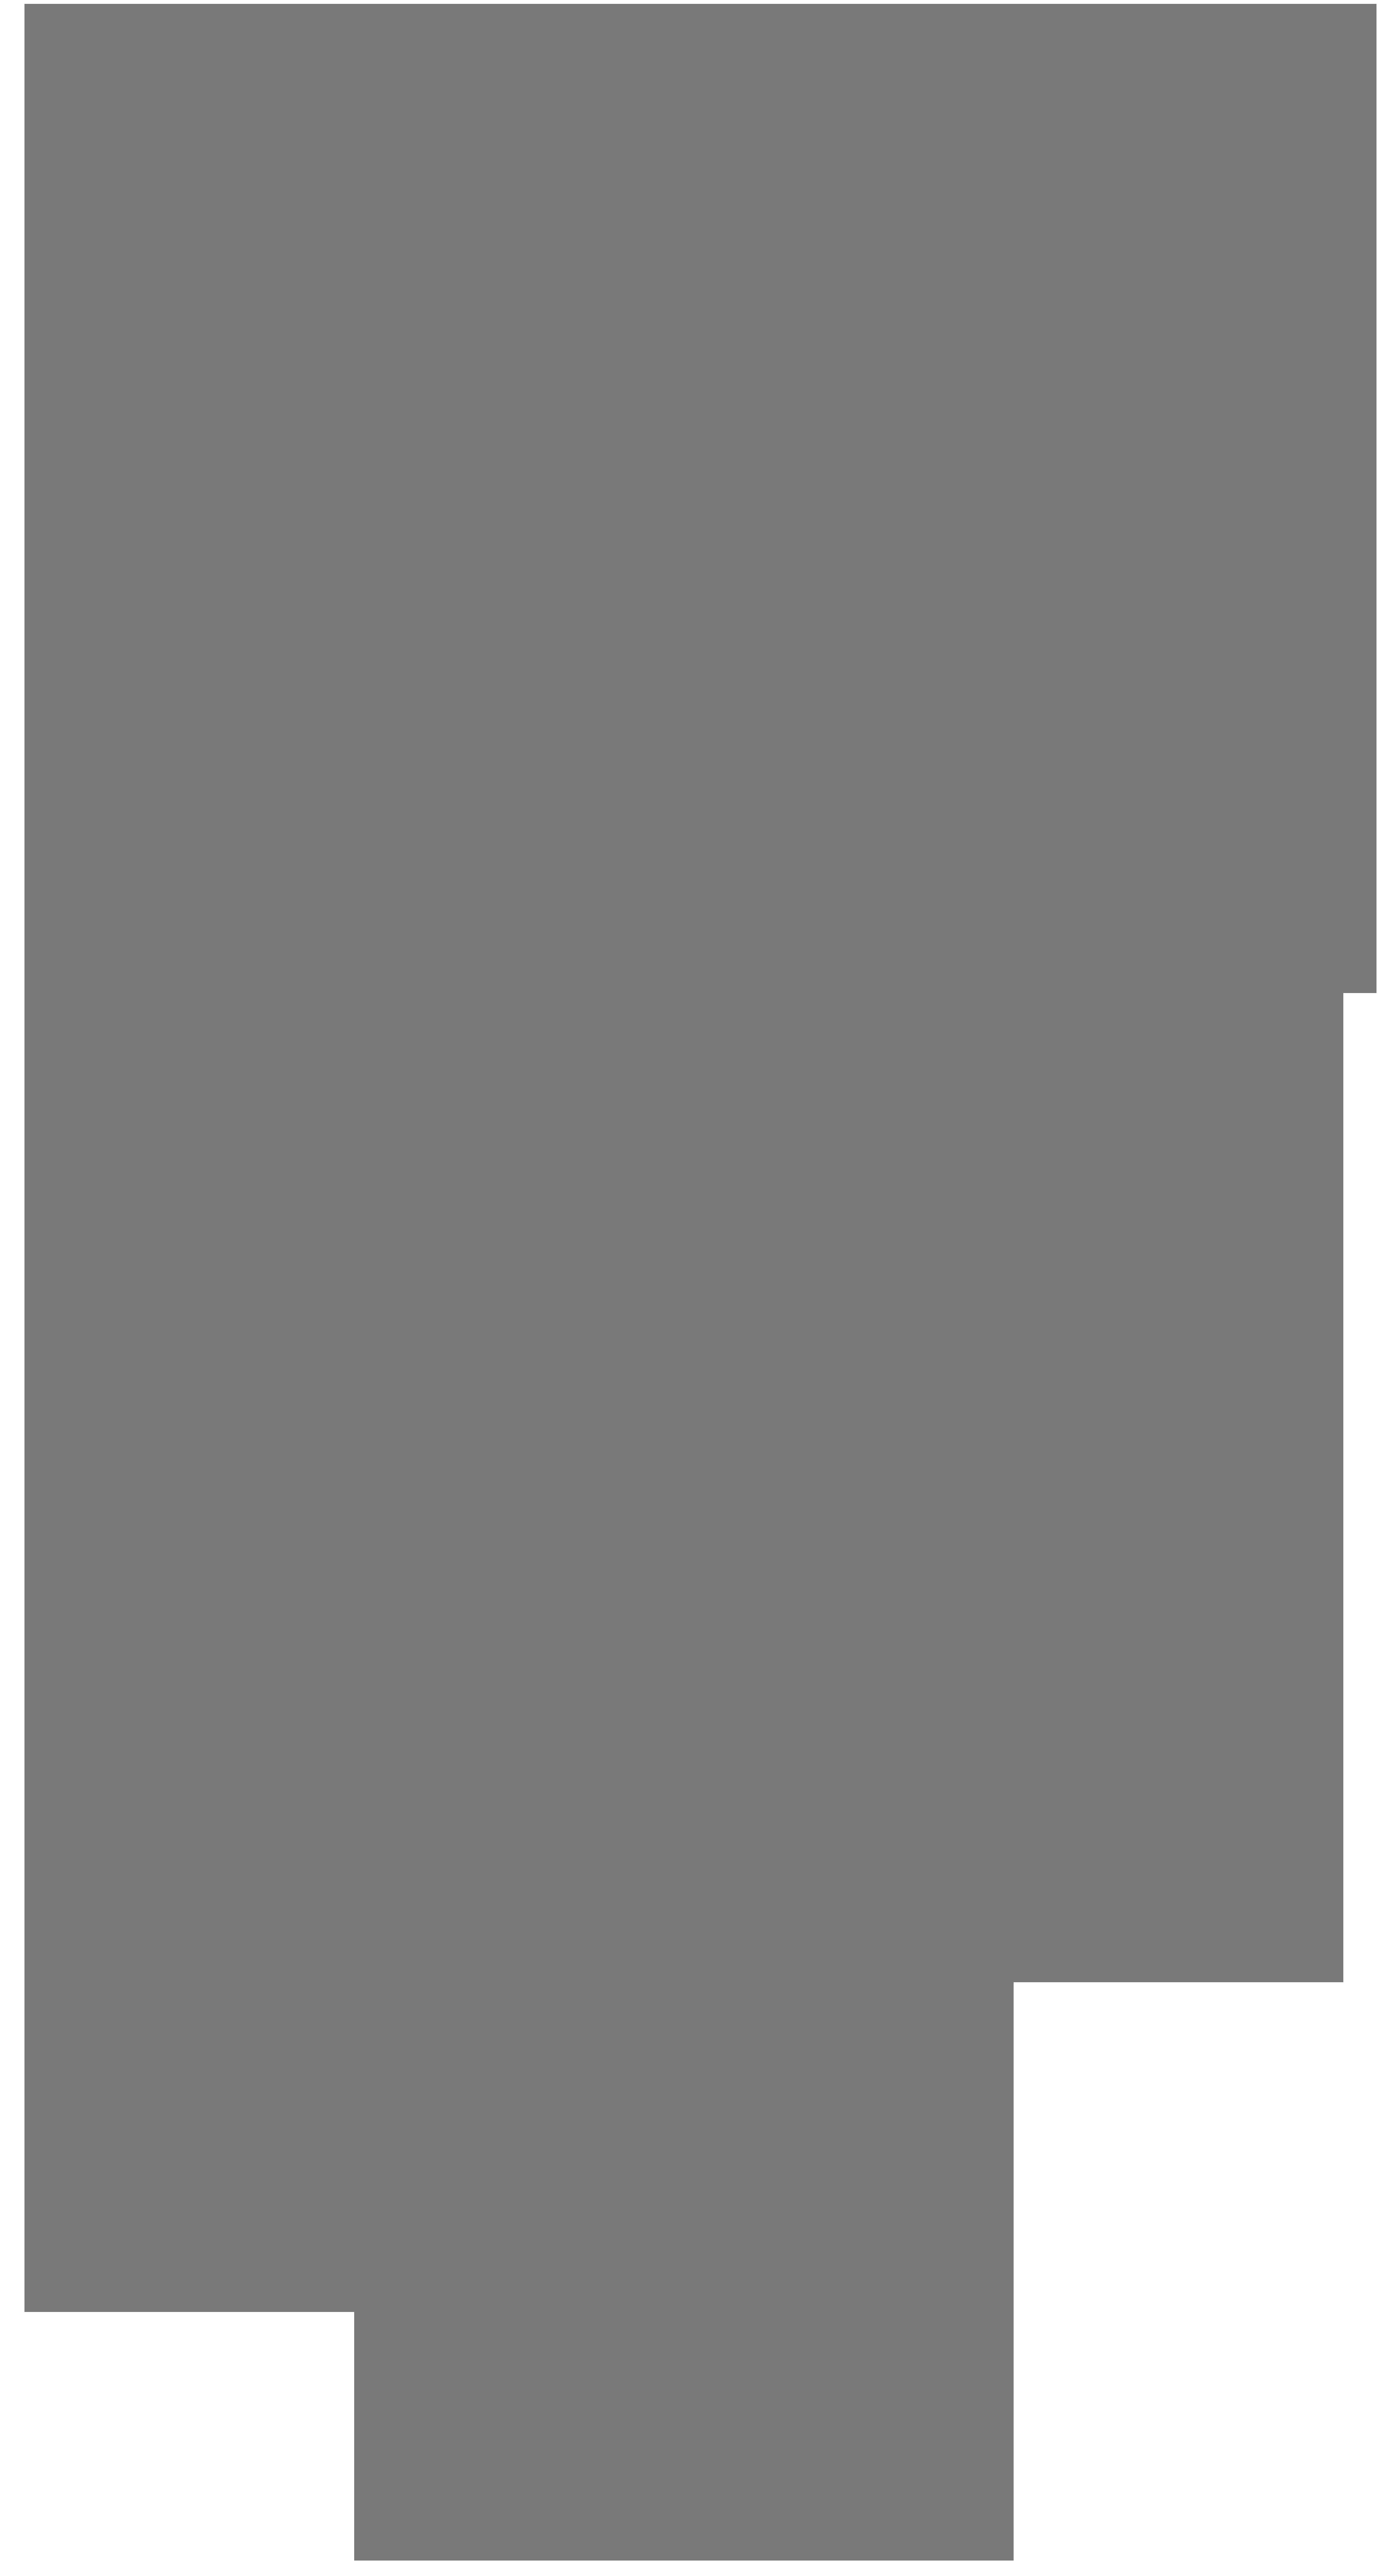 Dark Smoke Clip Art Transparent Image.